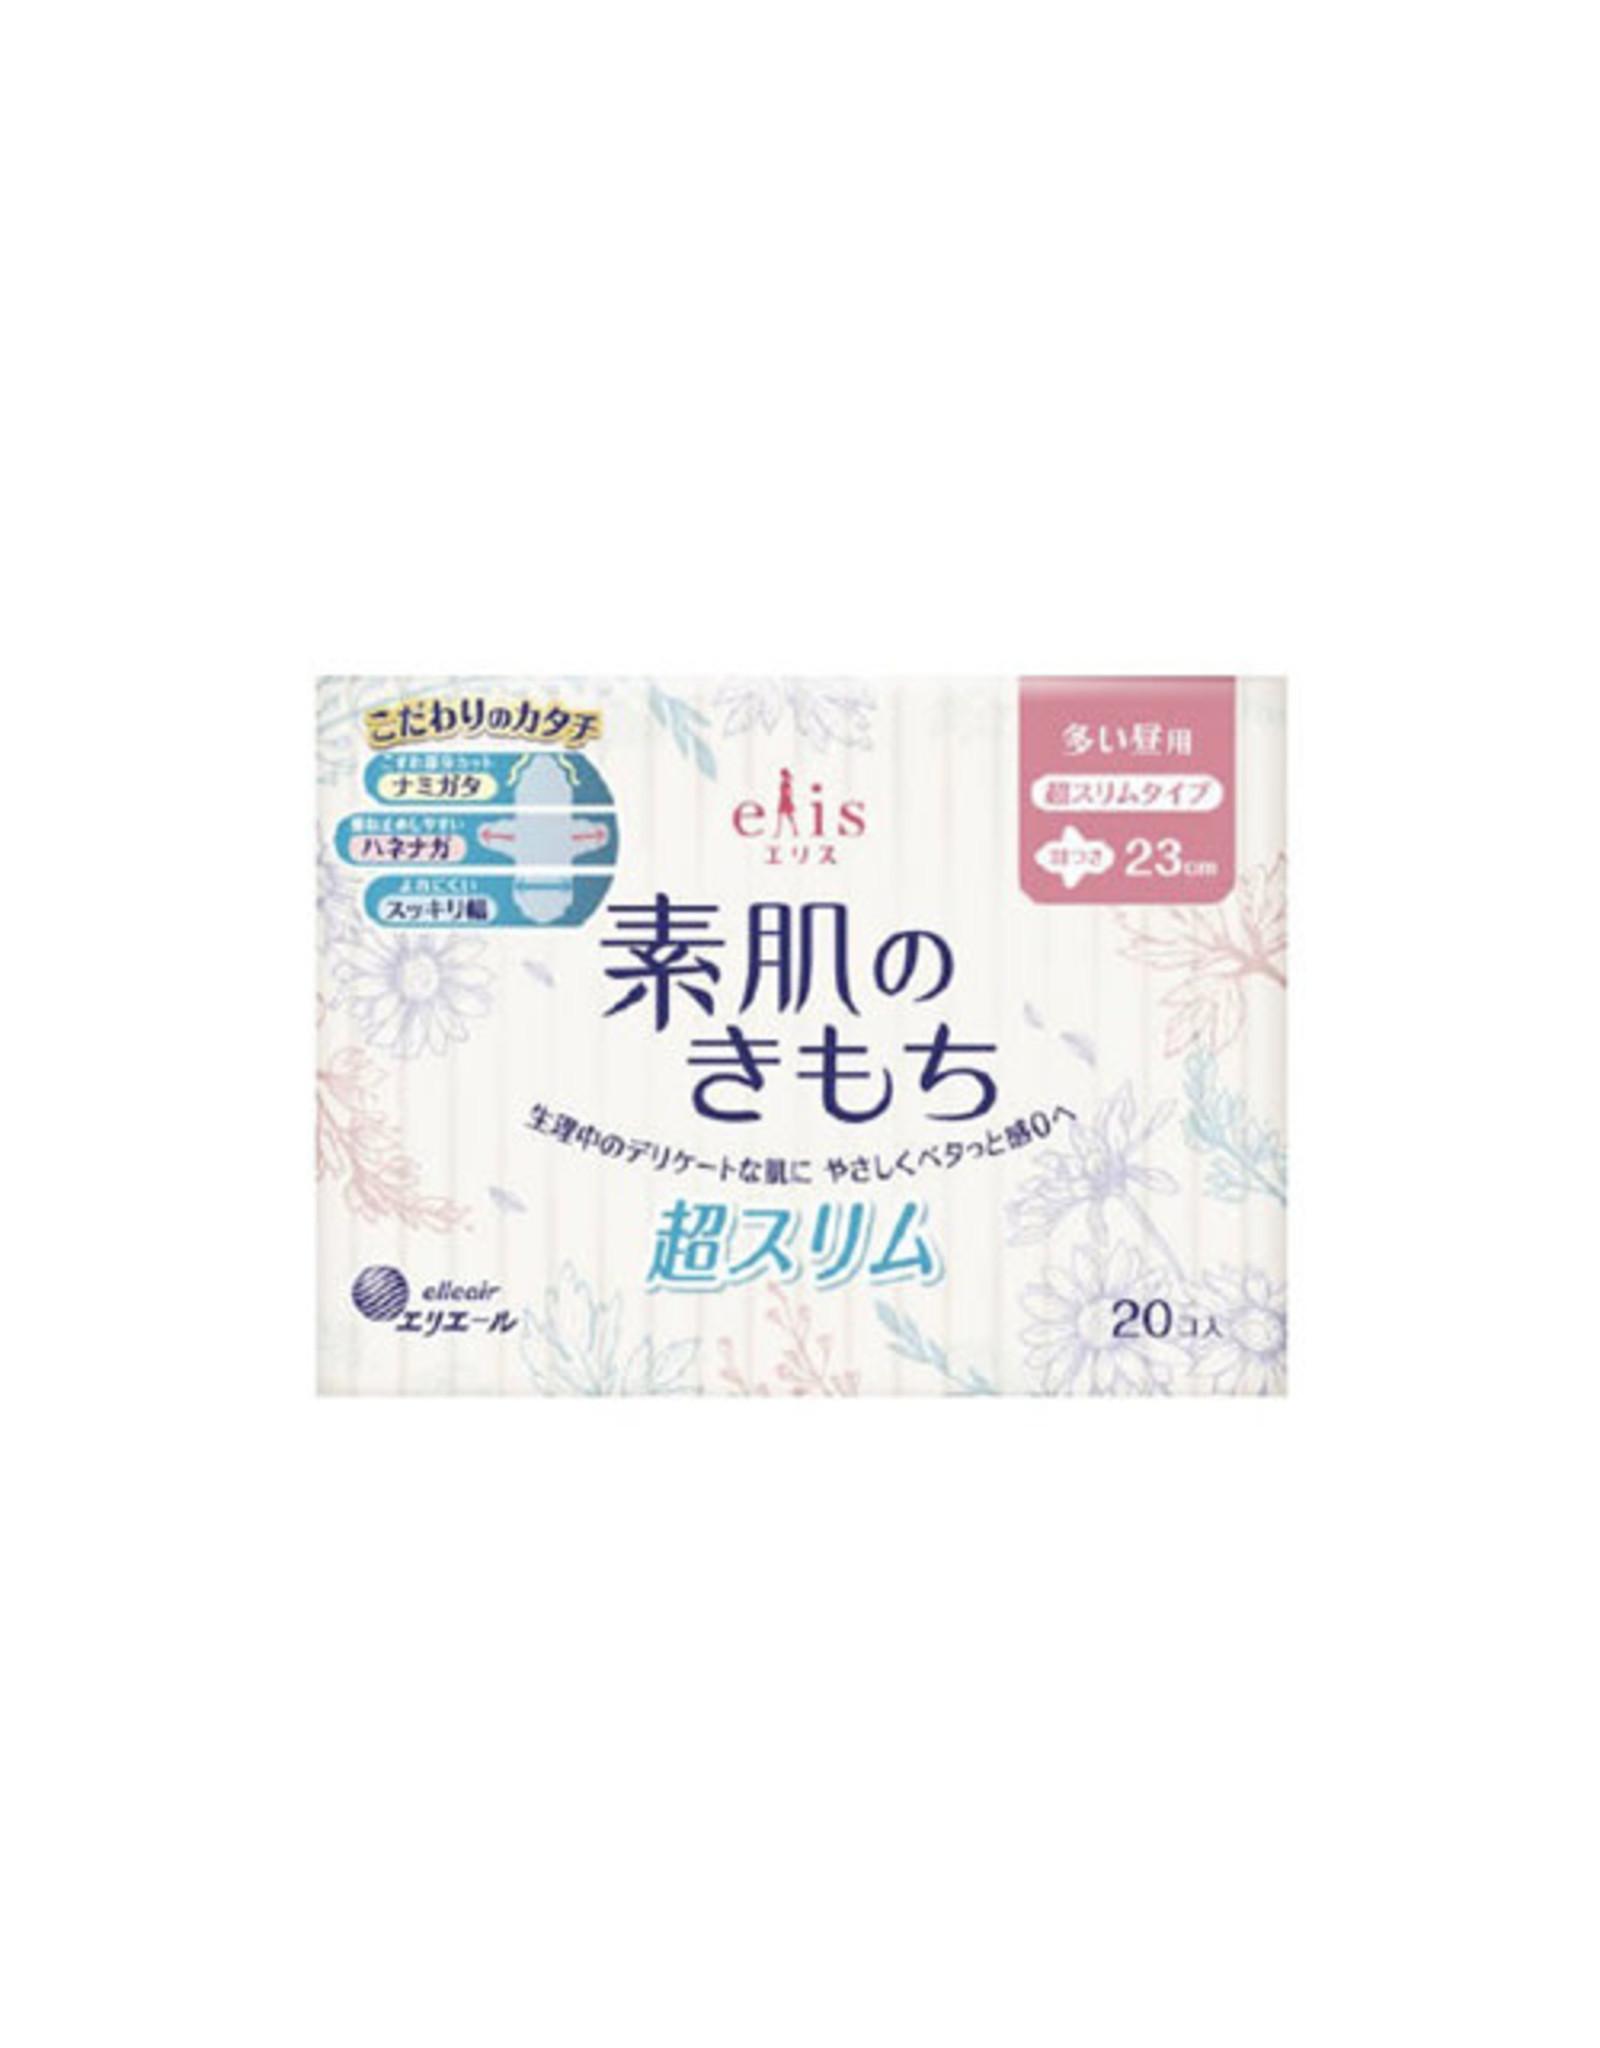 Elleair Elis Megami Sanitary Napkin Slim Heavy Daytime W/Wing 23Cm/20Pcs